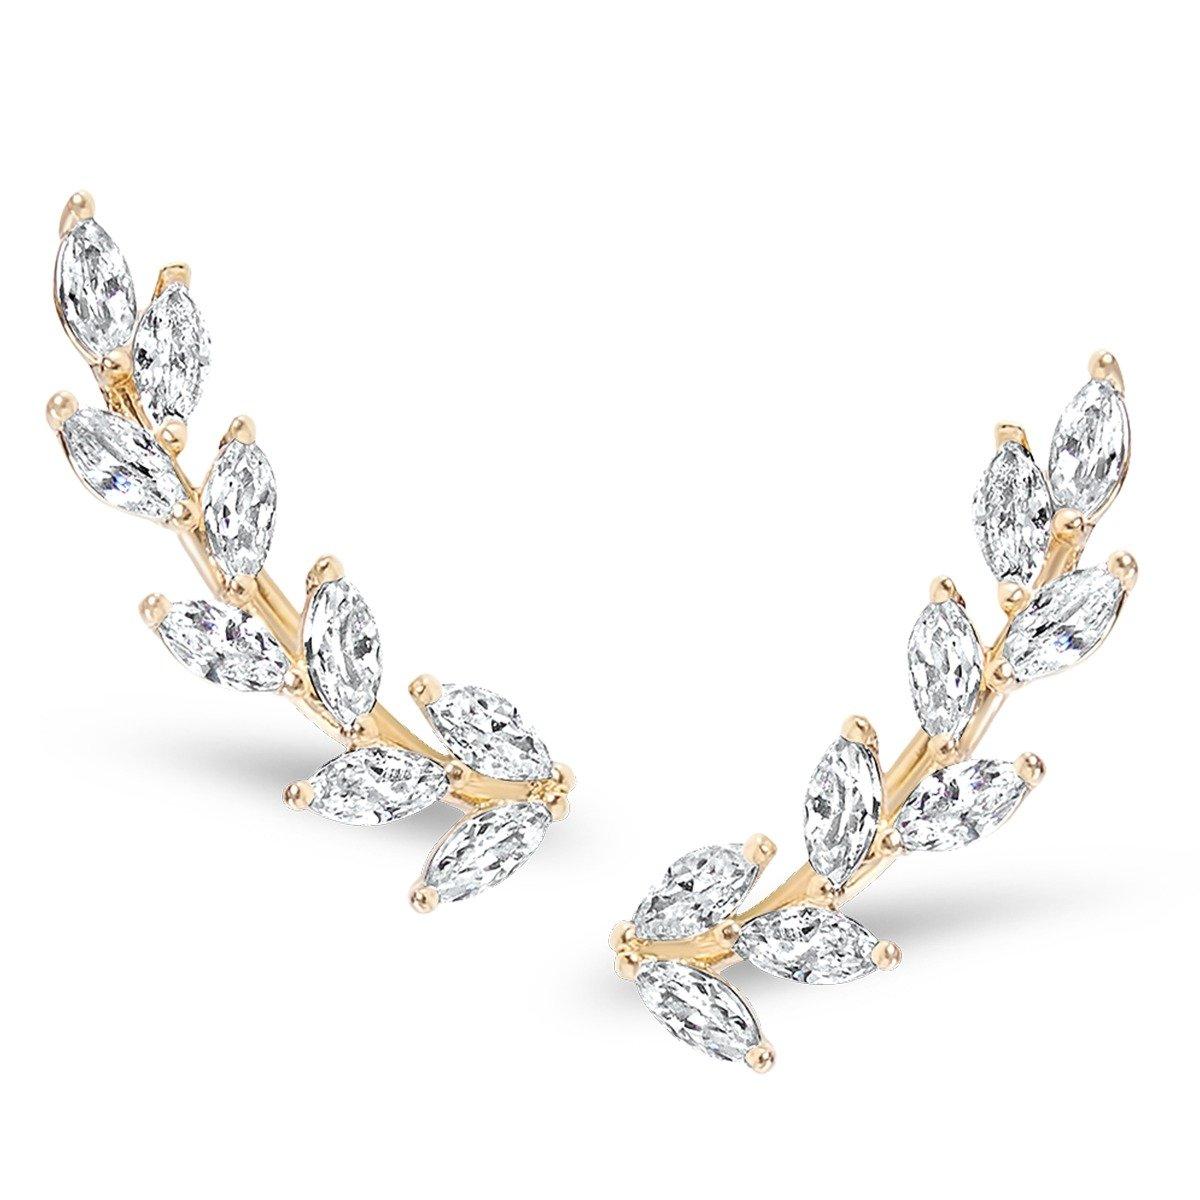 d0fa5d112 Amazon.com: Humble Chic Crystal Leaf Ear Climbers - Simulated Diamond  Flower Crawler Cuff Stud Earrings, Gold-Tone Petals: Jewelry